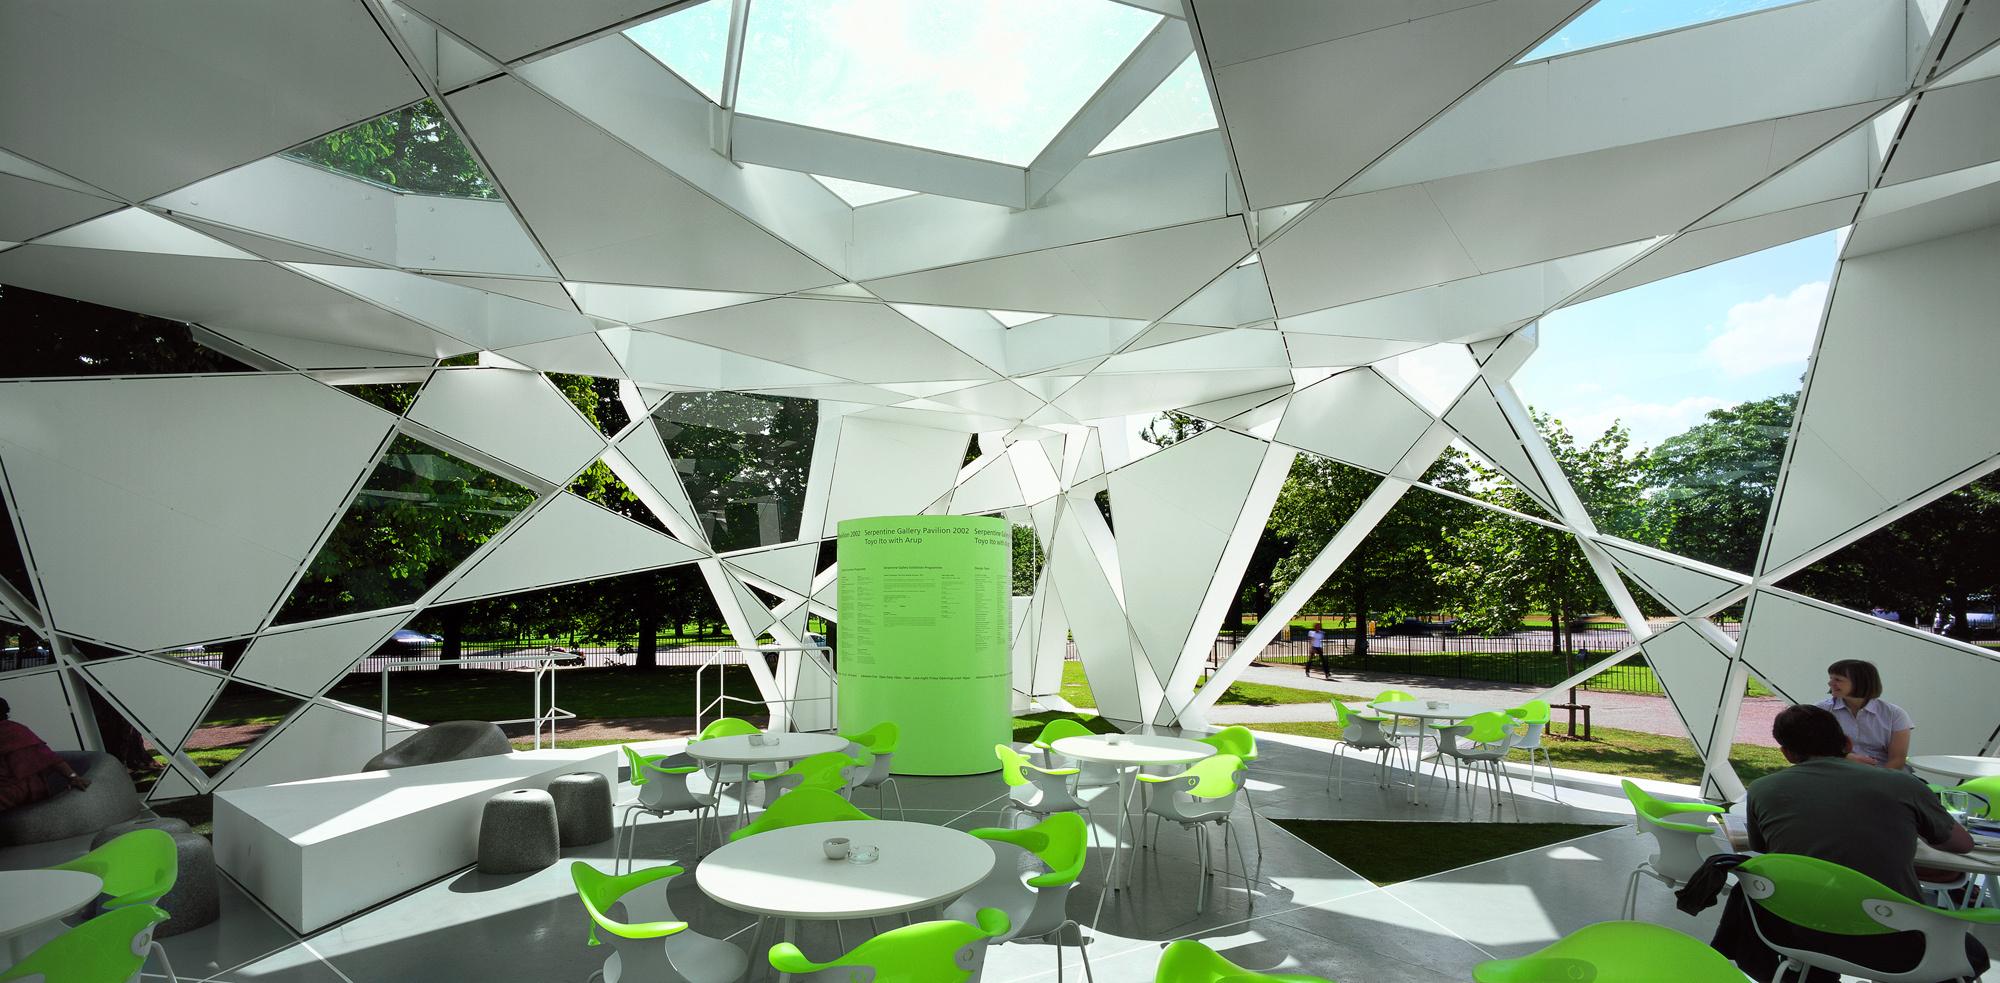 Najpoznatije svetske arhitekte 51423dc6b3fc4b43eb000059_serpentine-gallery-pavilion-2002-toyo-ito-cecil-balmond-arup_6-iii